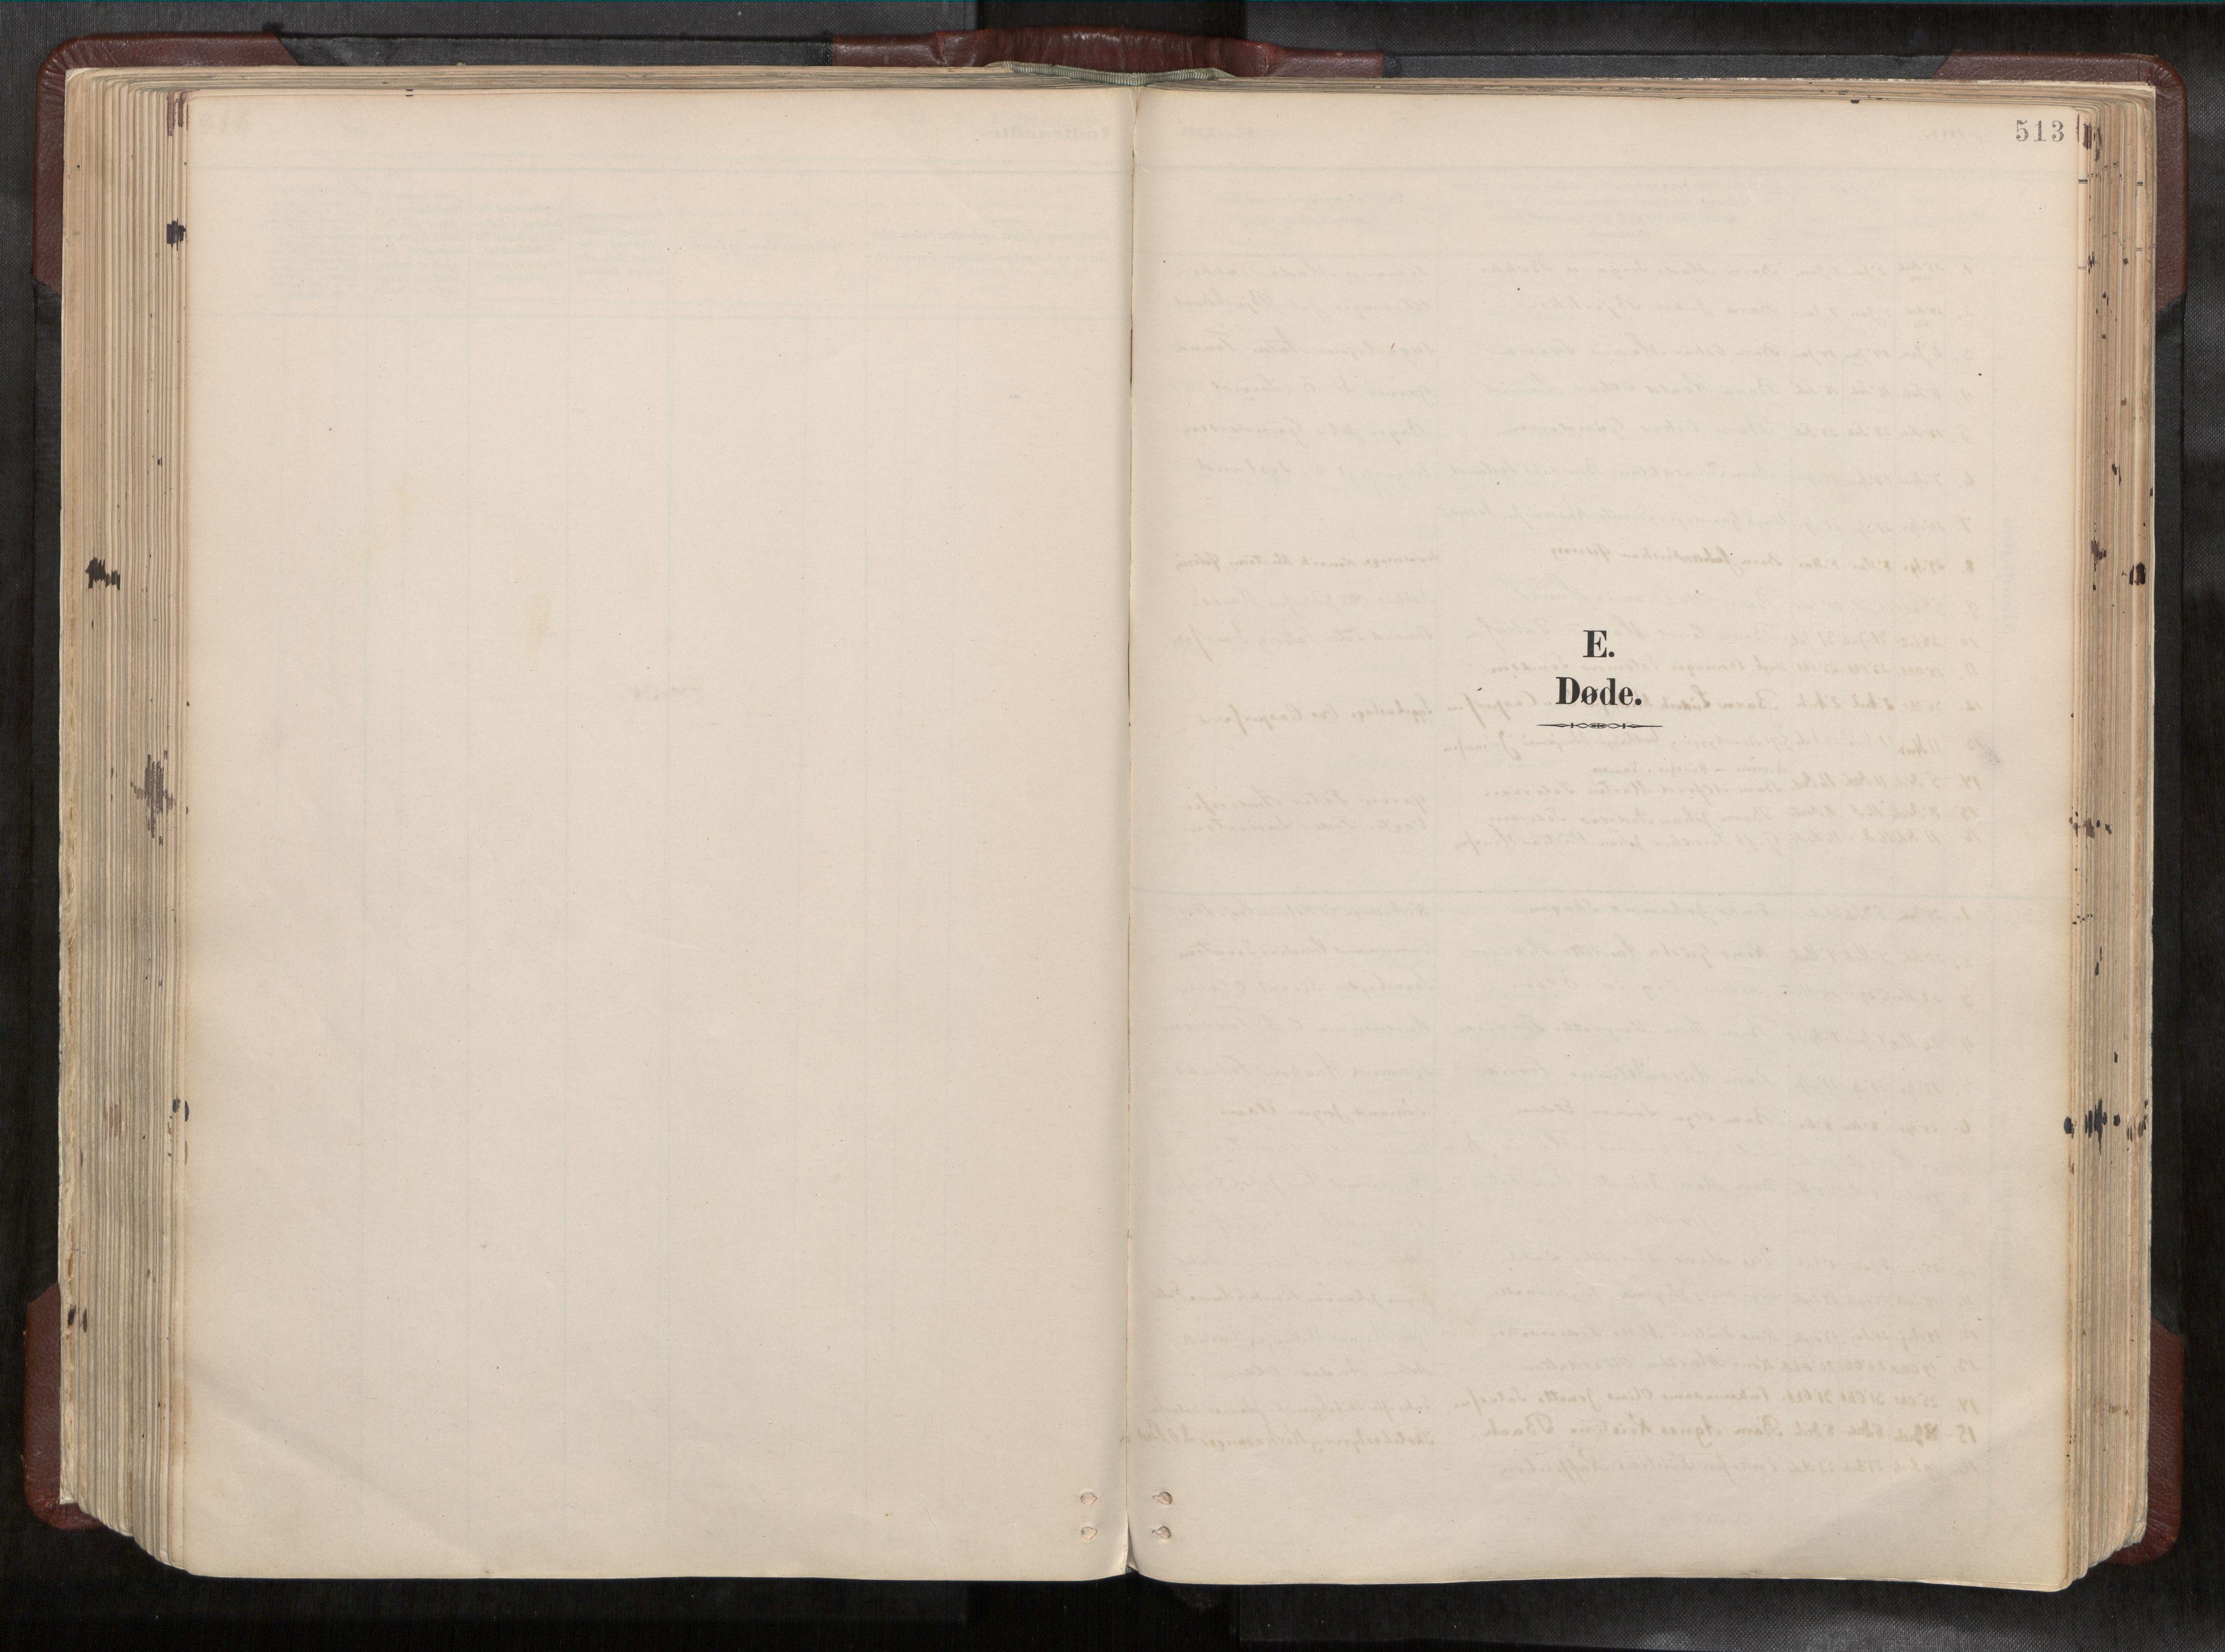 SAT, Ministerialprotokoller, klokkerbøker og fødselsregistre - Nord-Trøndelag, 768/L0579a: Ministerialbok nr. 768A14, 1887-1931, s. 513